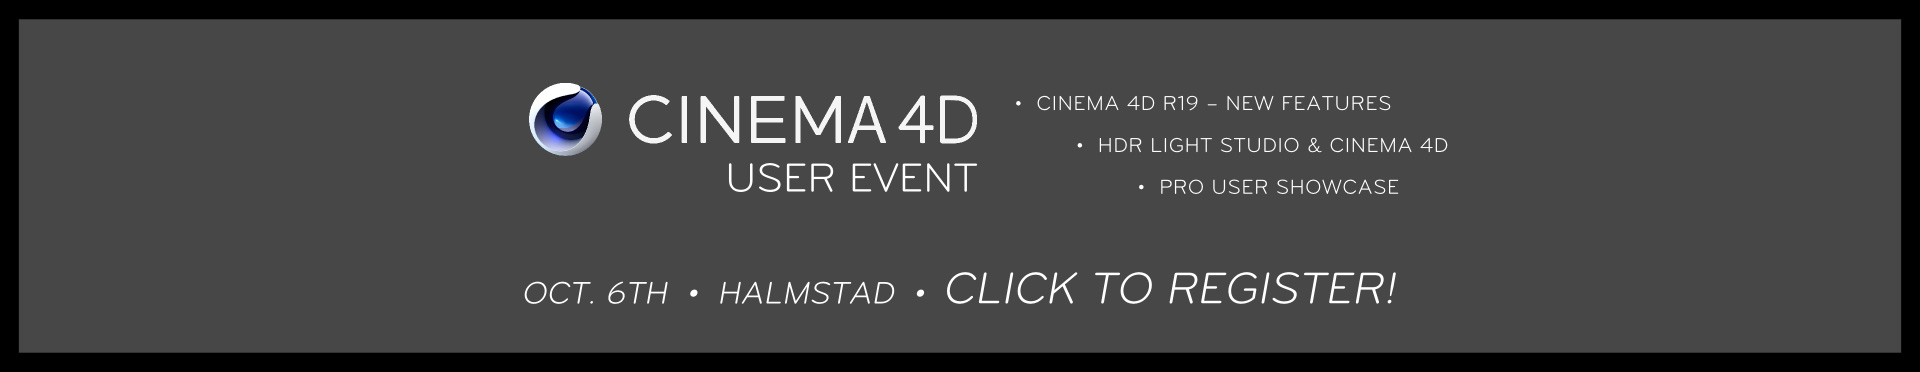 Cinema 4D User Event